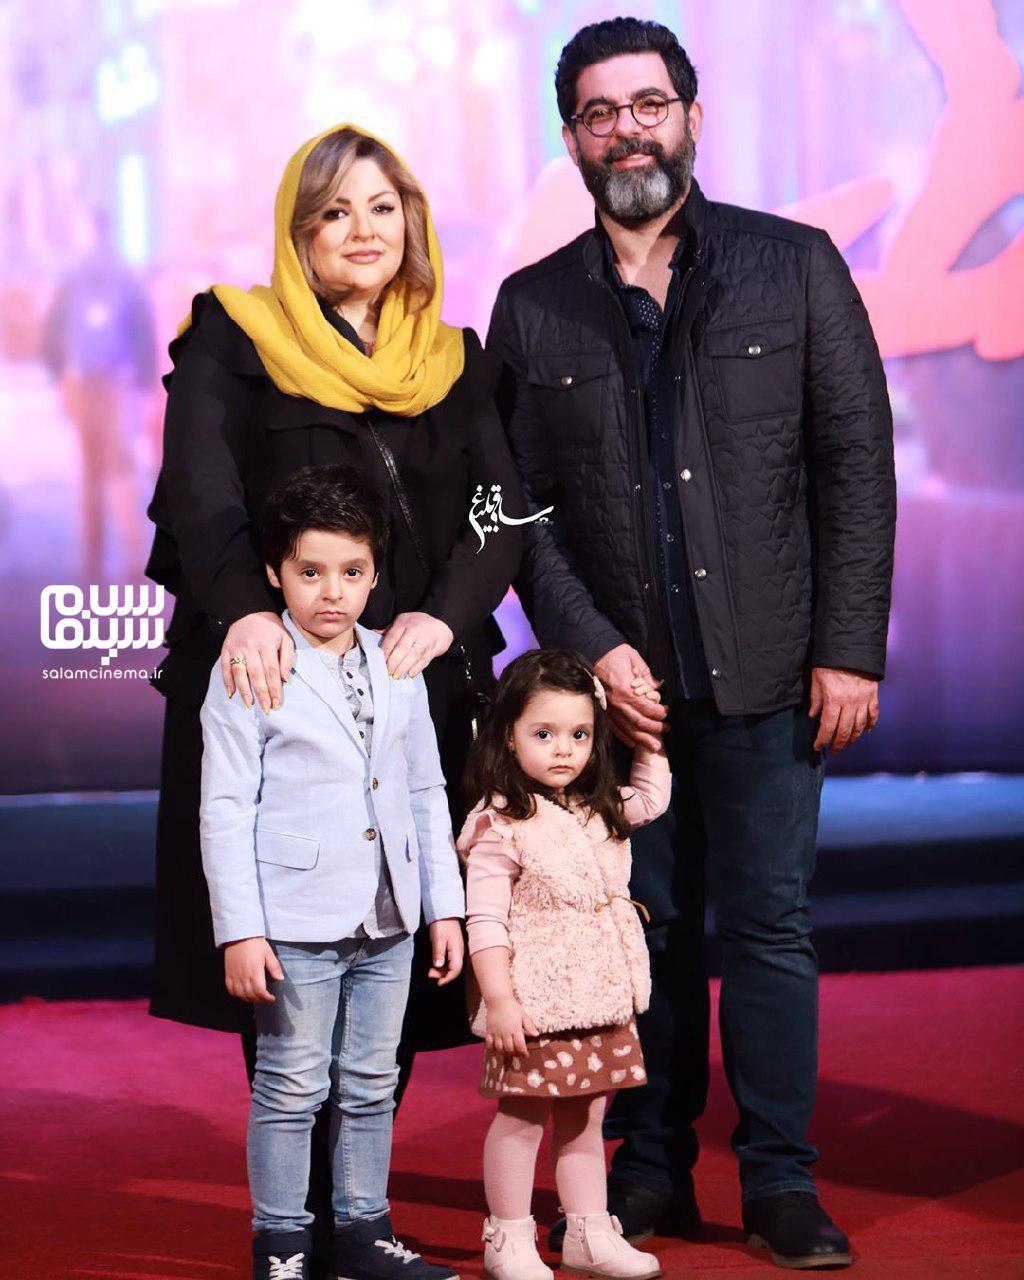 مصطفی کیایی درکنار همسر و فرزندانش - اکران خصوصی فیلم مطرب - سینما چارسو